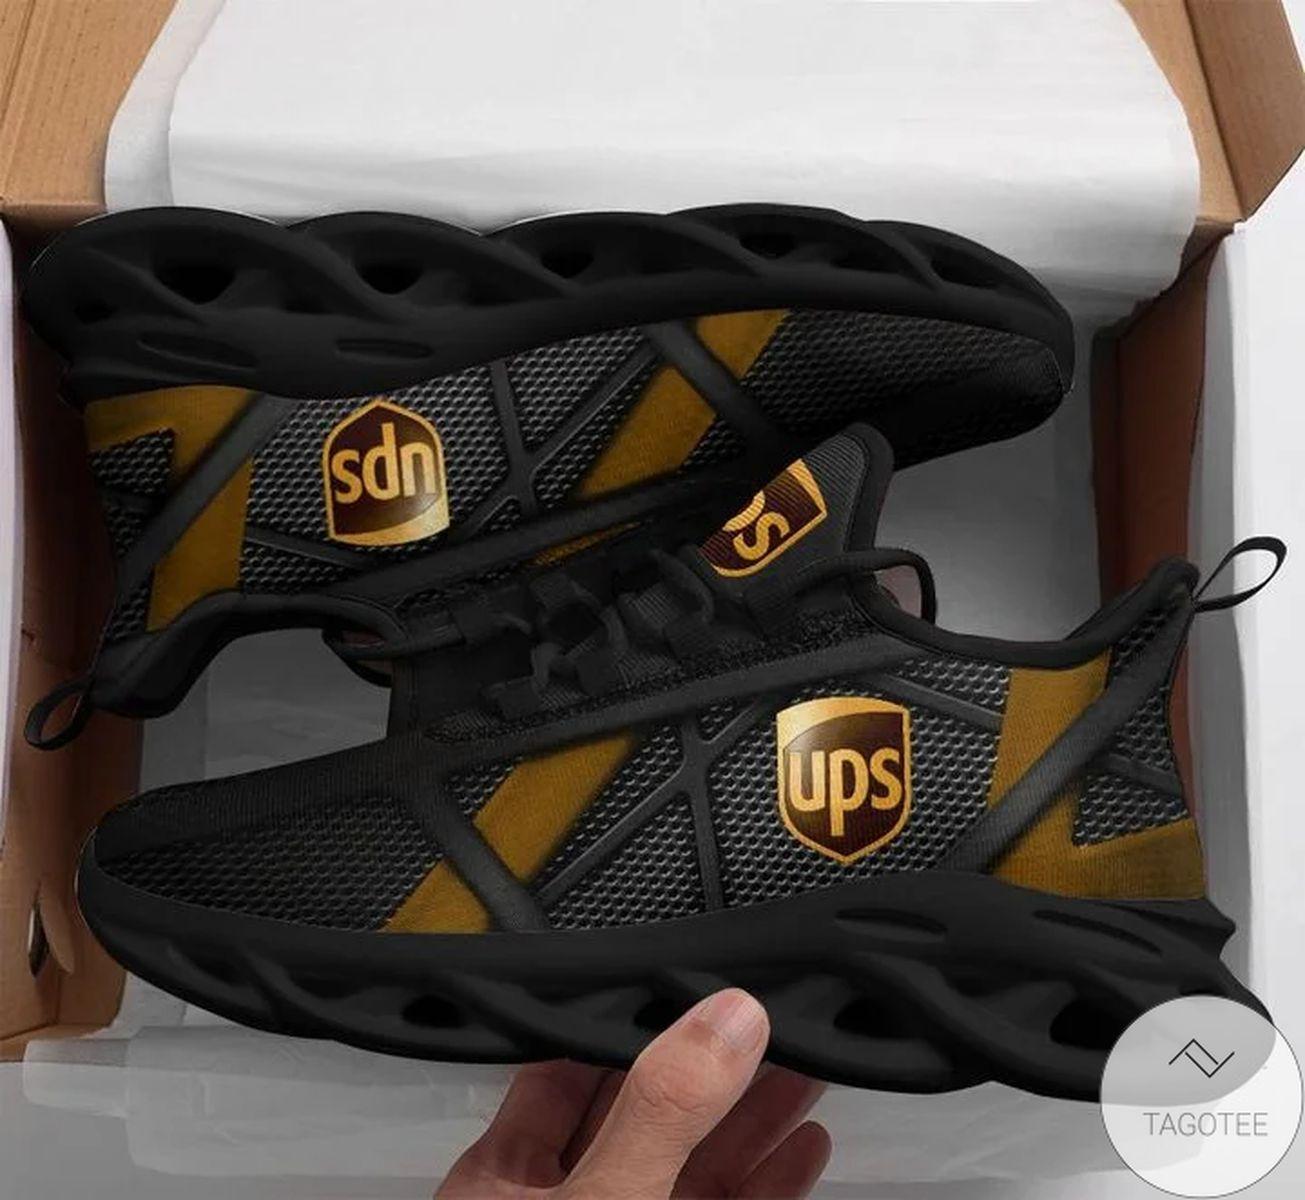 Ups Sneaker Max Soul Shoes